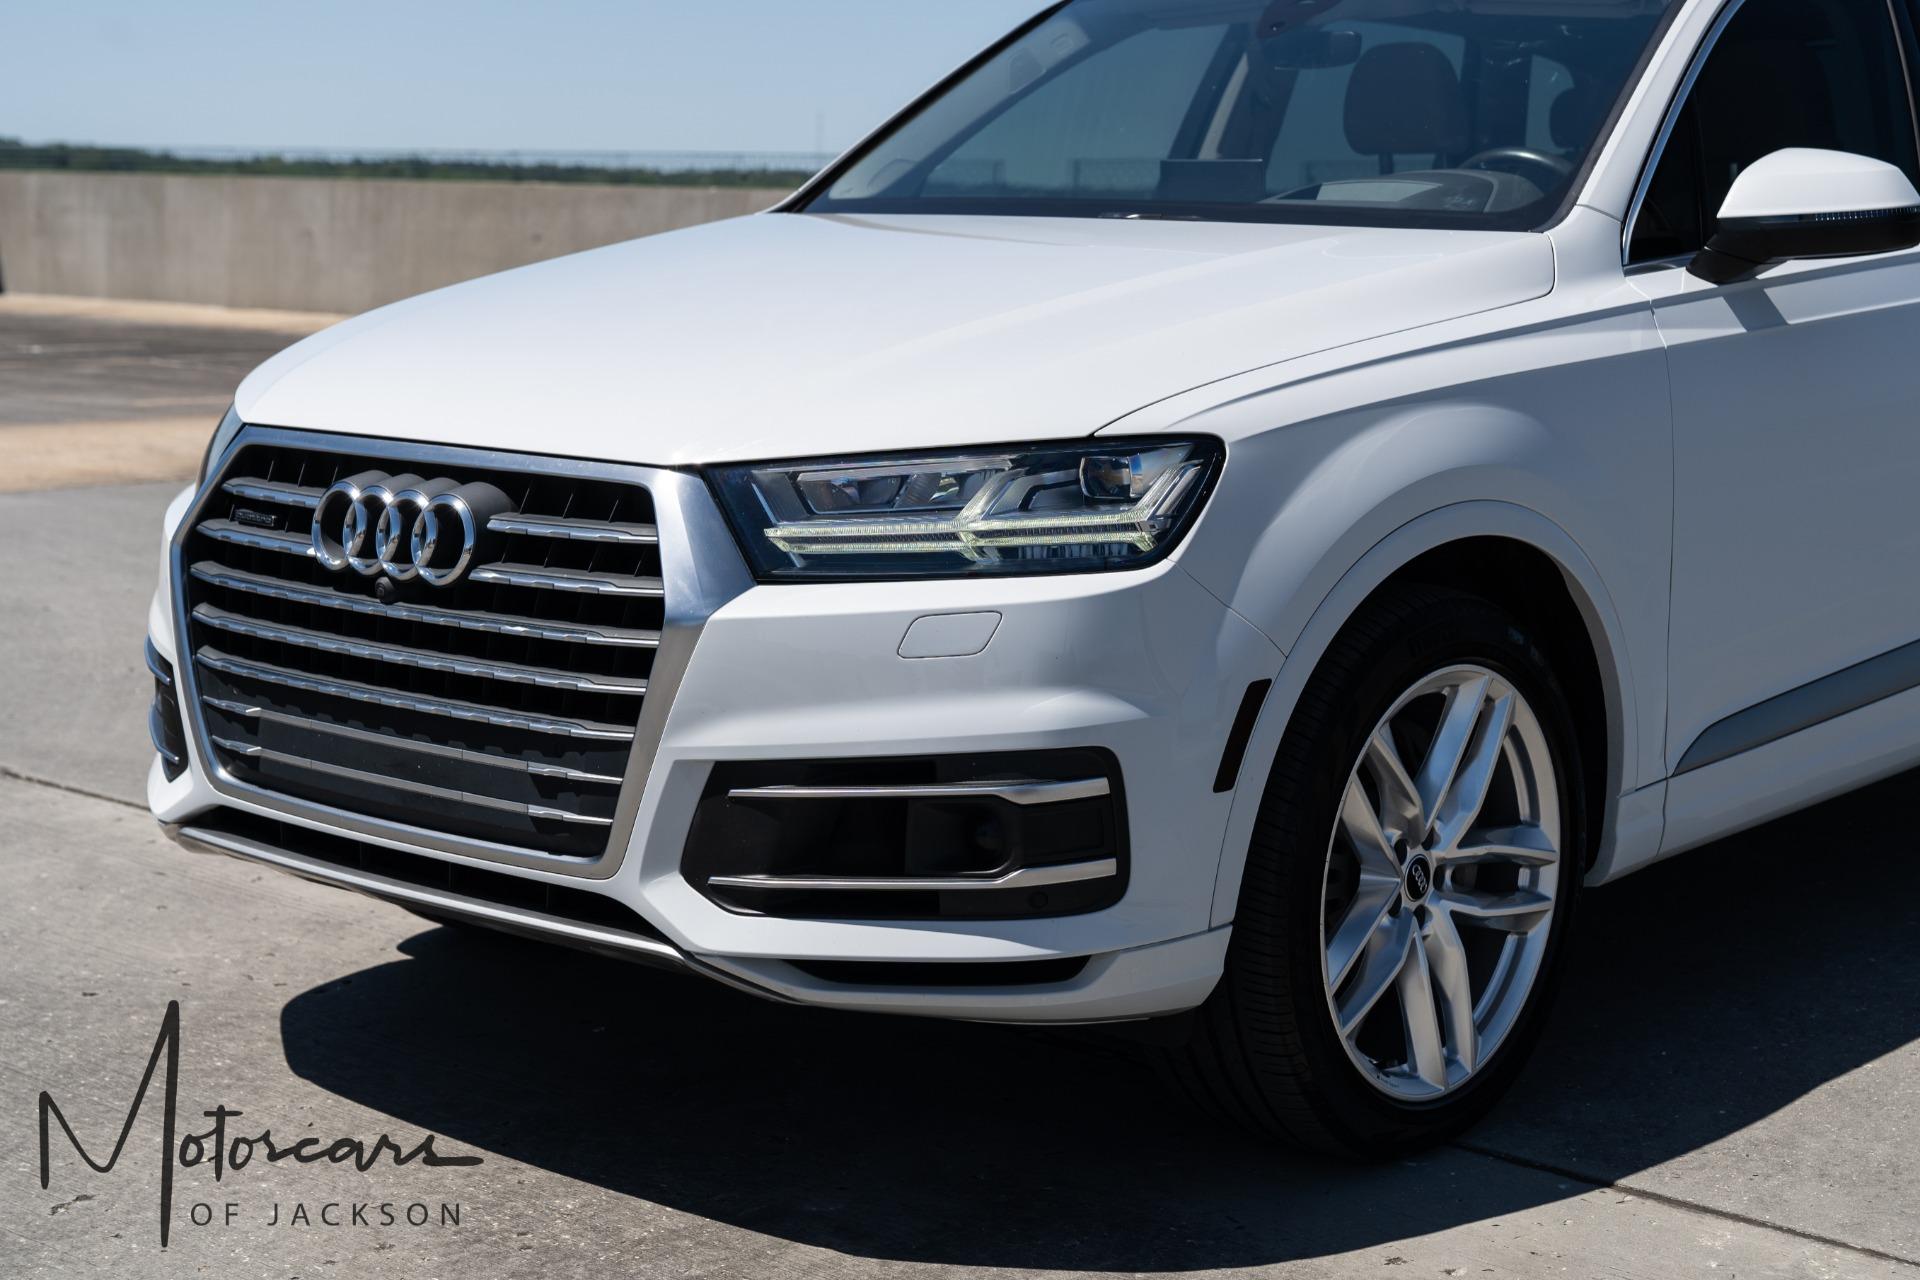 Used-2018-Audi-Q7-Prestige-for-sale-Jackson-MS